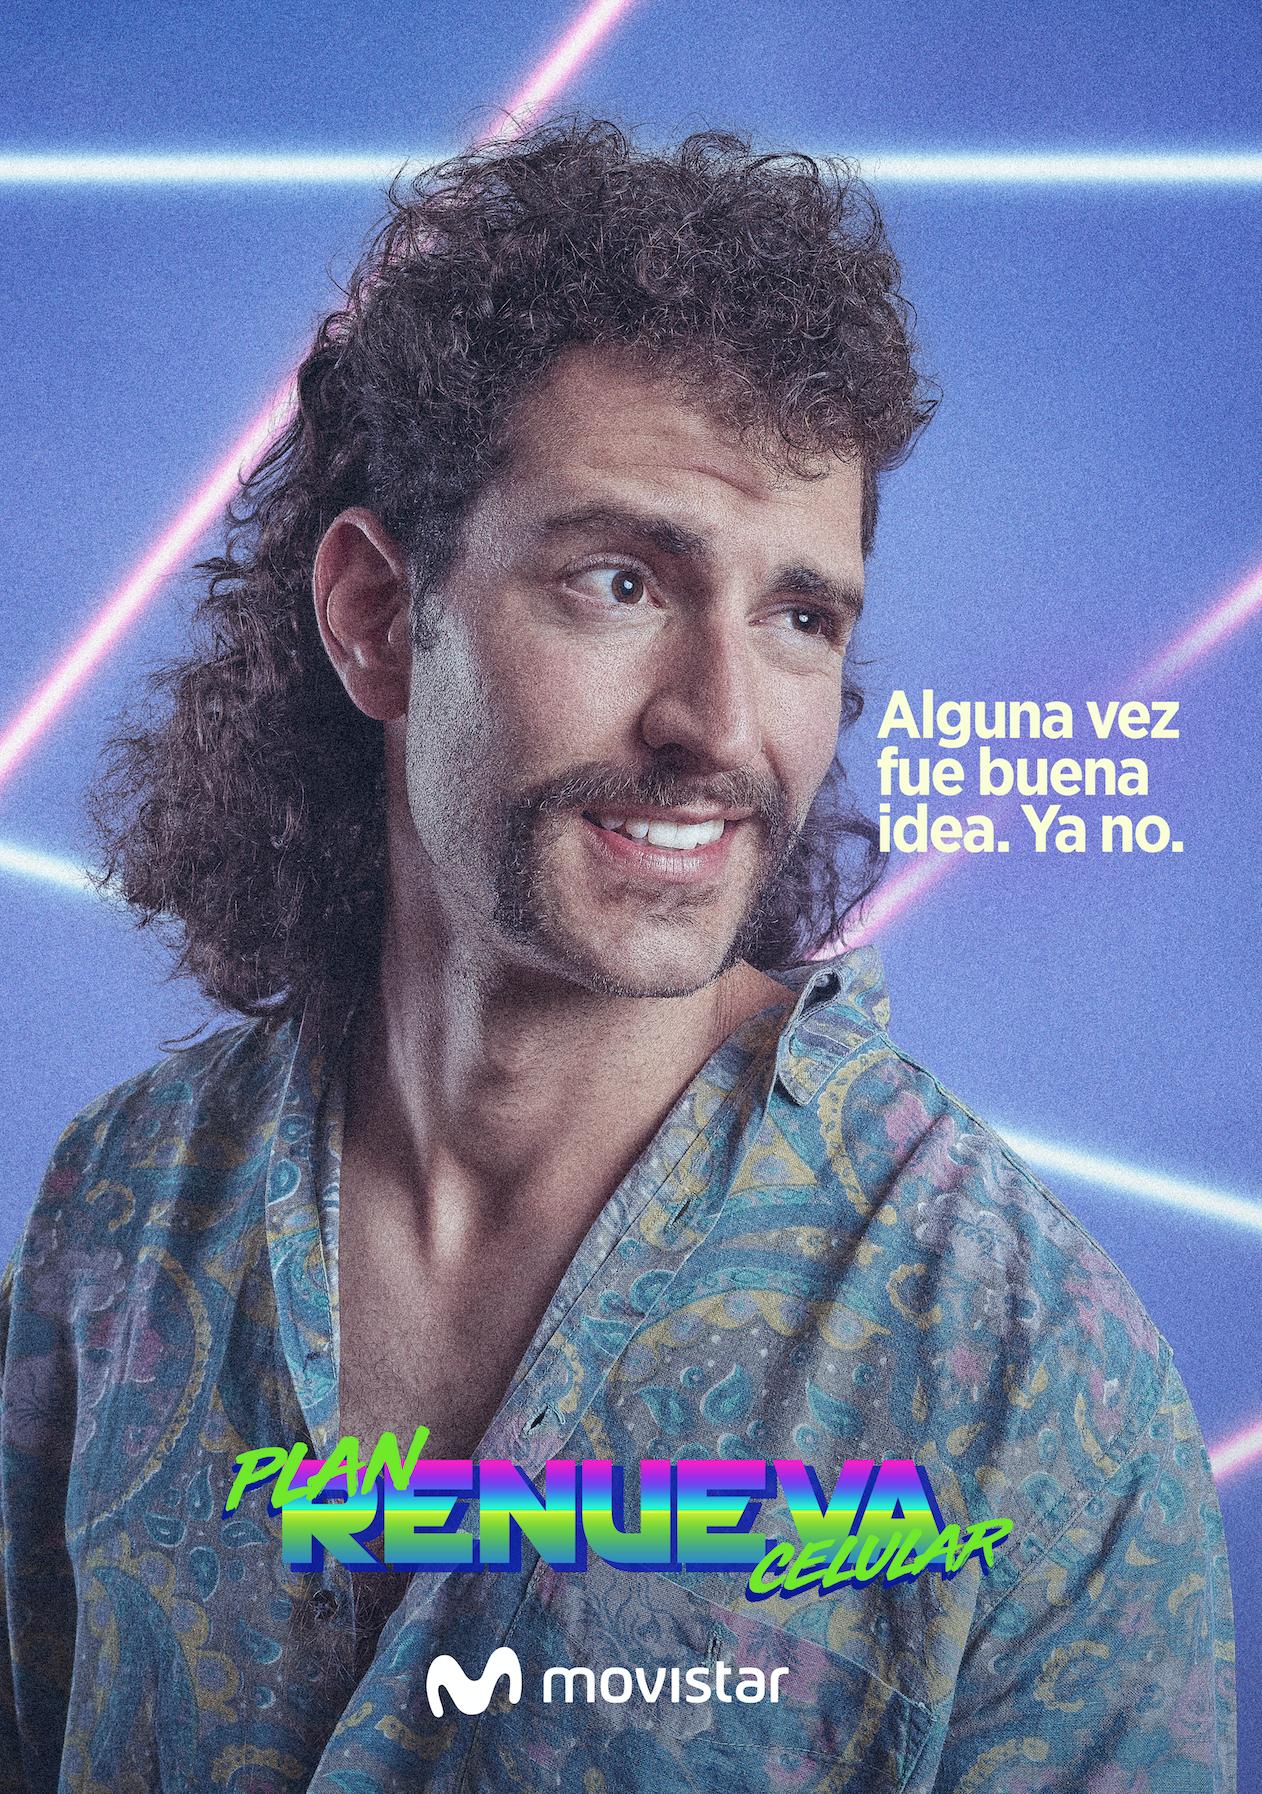 Movistar Print Ad - Renew Plan, 3